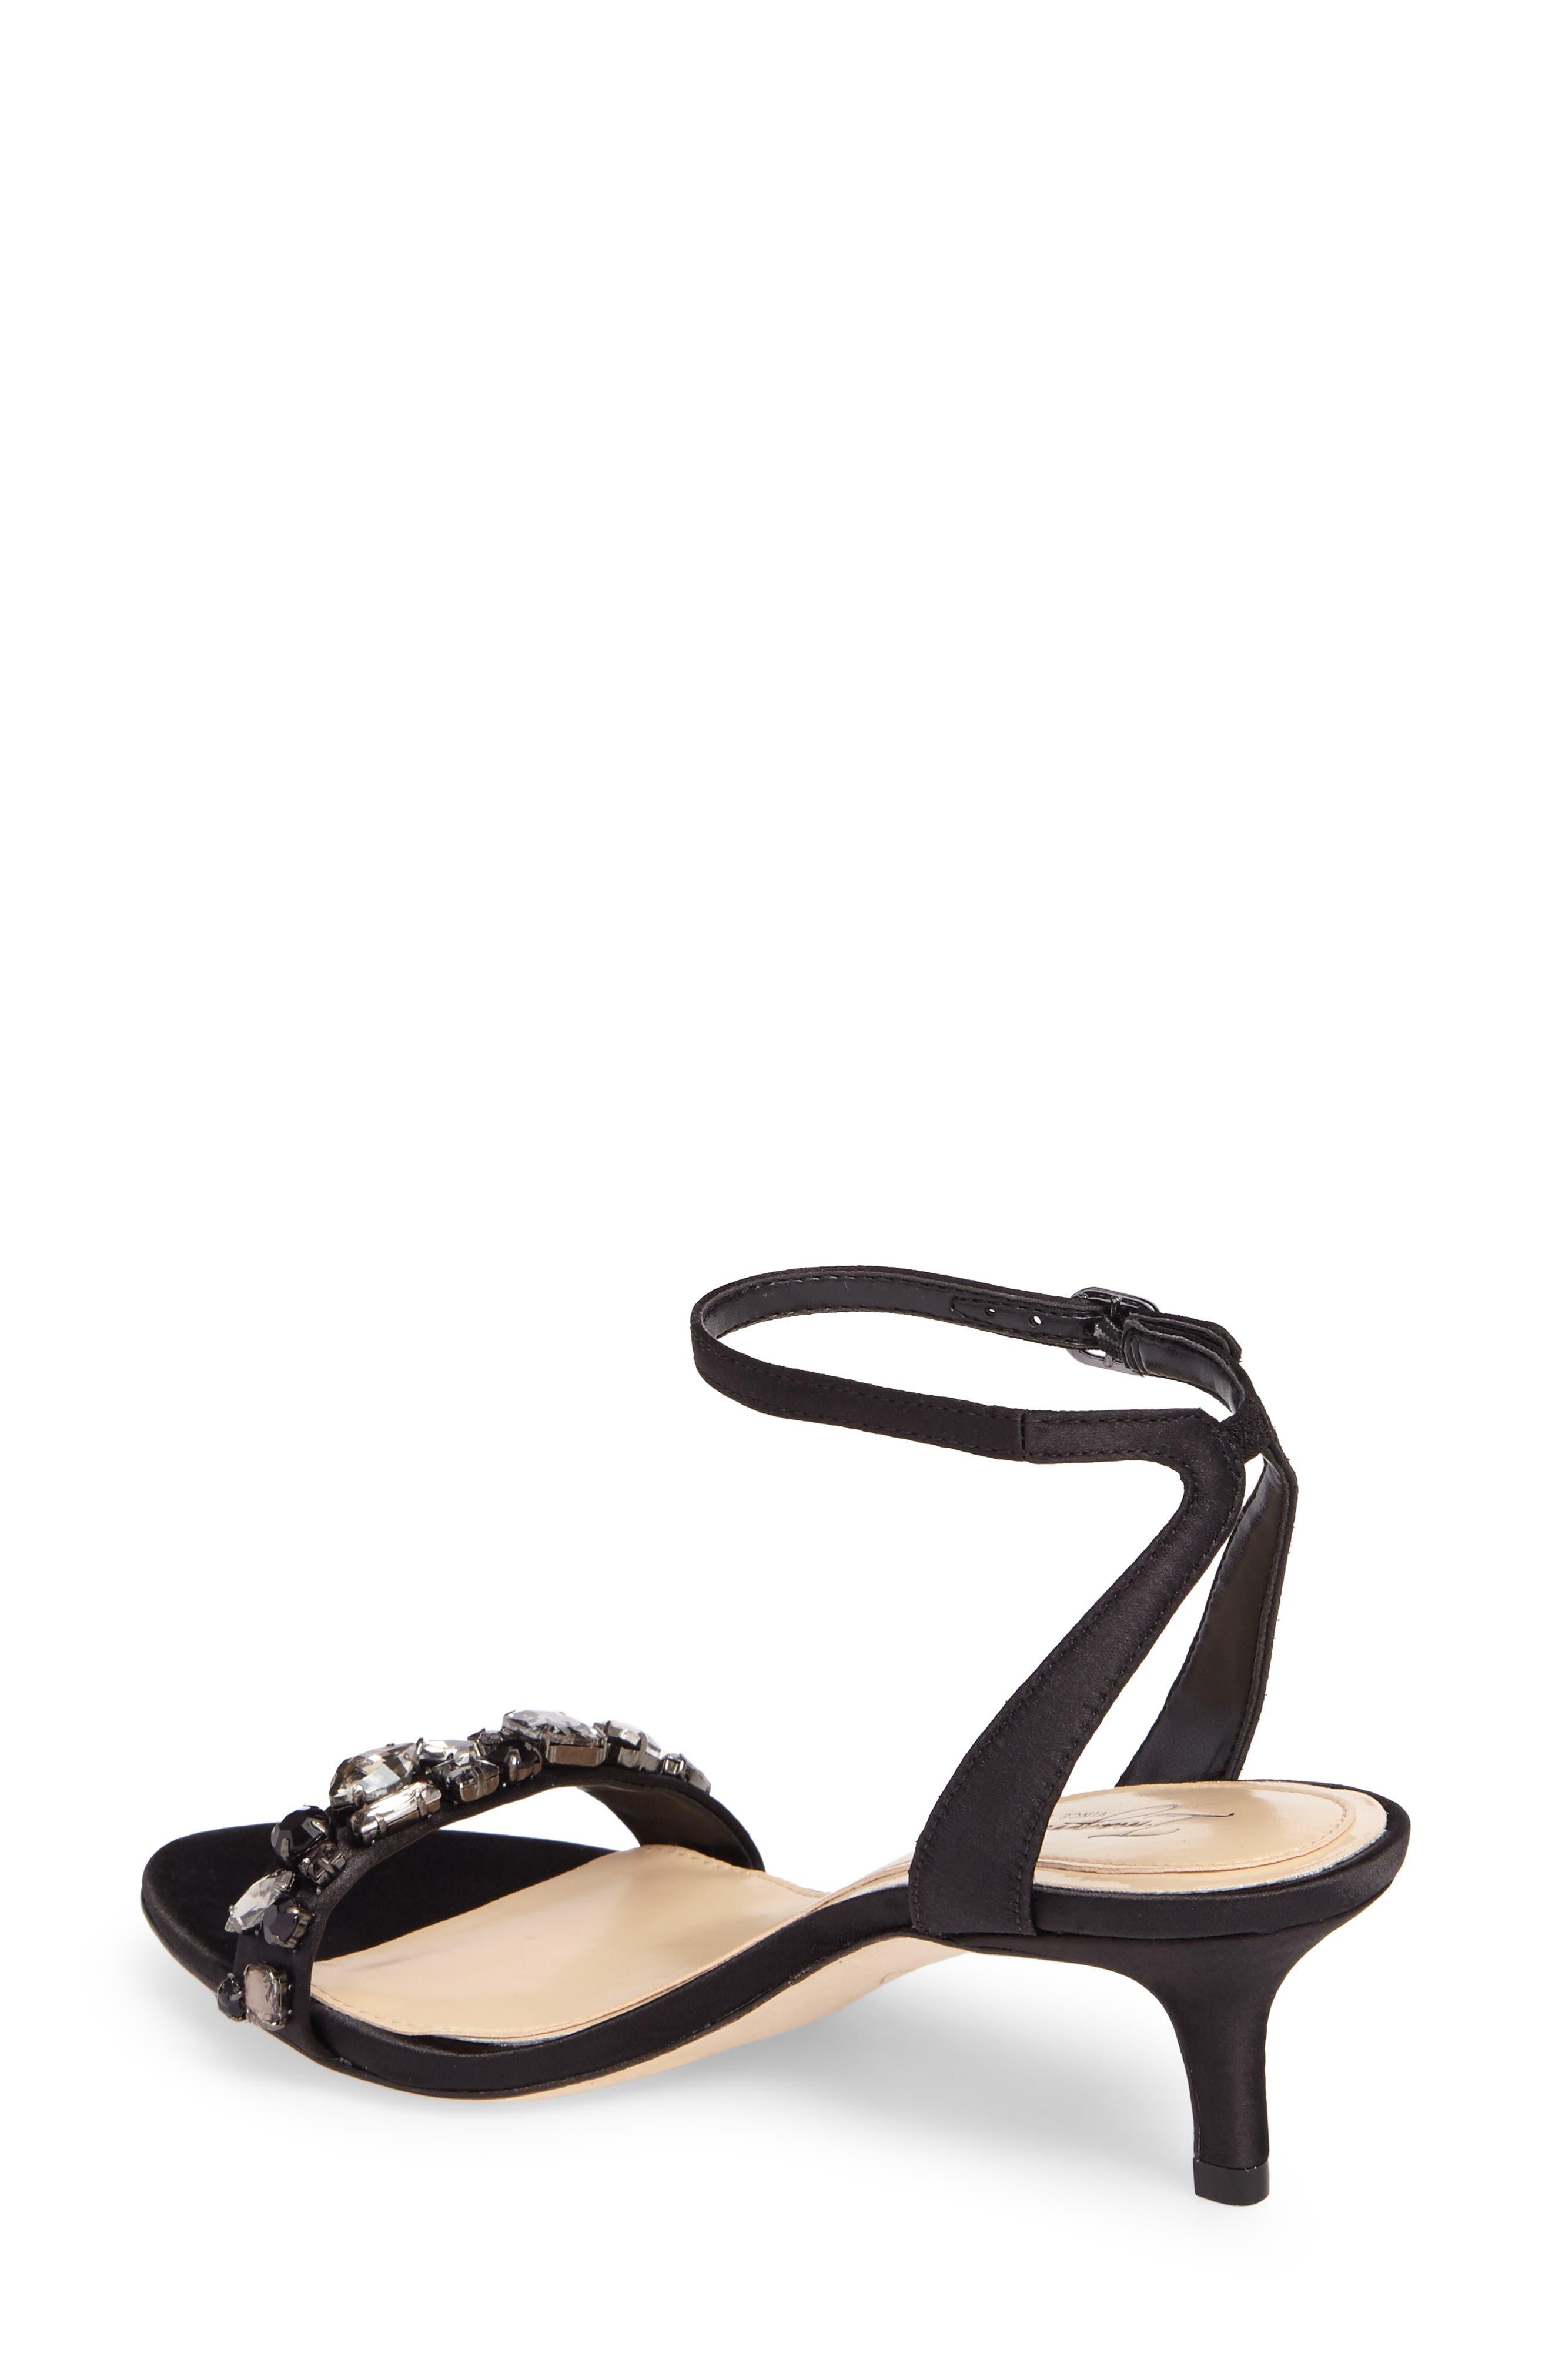 Imagine Vince Camuto Kolo Embellished Kitten Heel Sandal,                             Alternate thumbnail 2, color,                             Black Satin